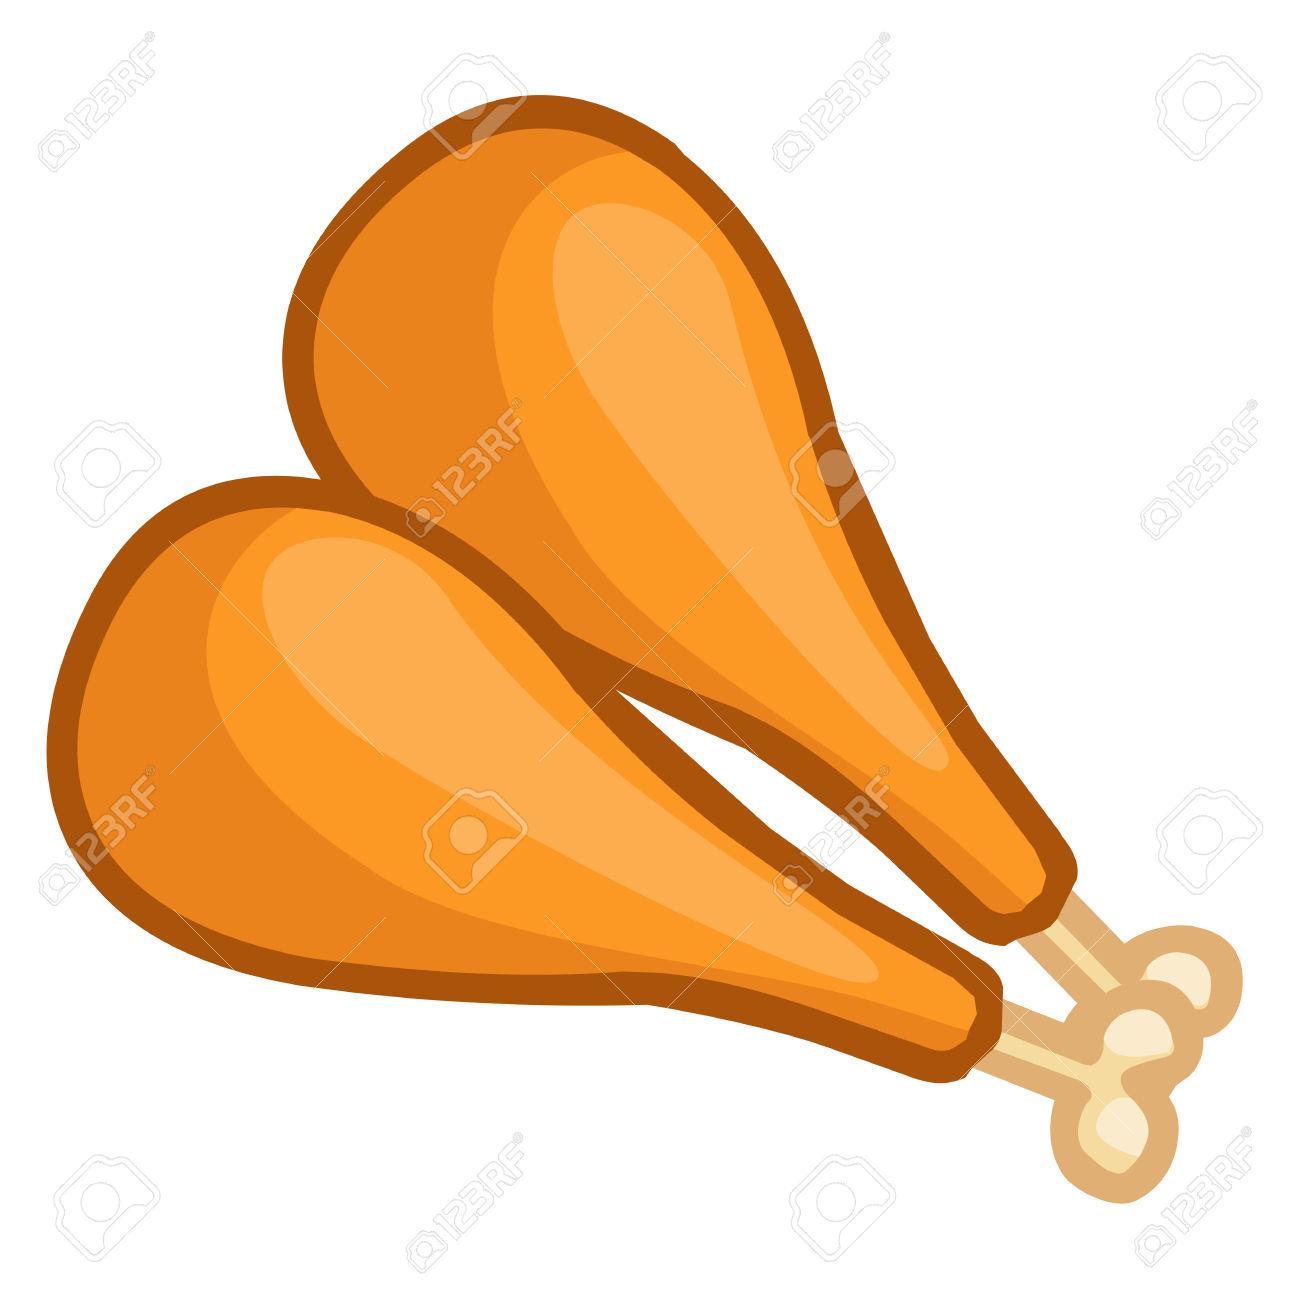 Chickens clipart joy. Fried chicken group best